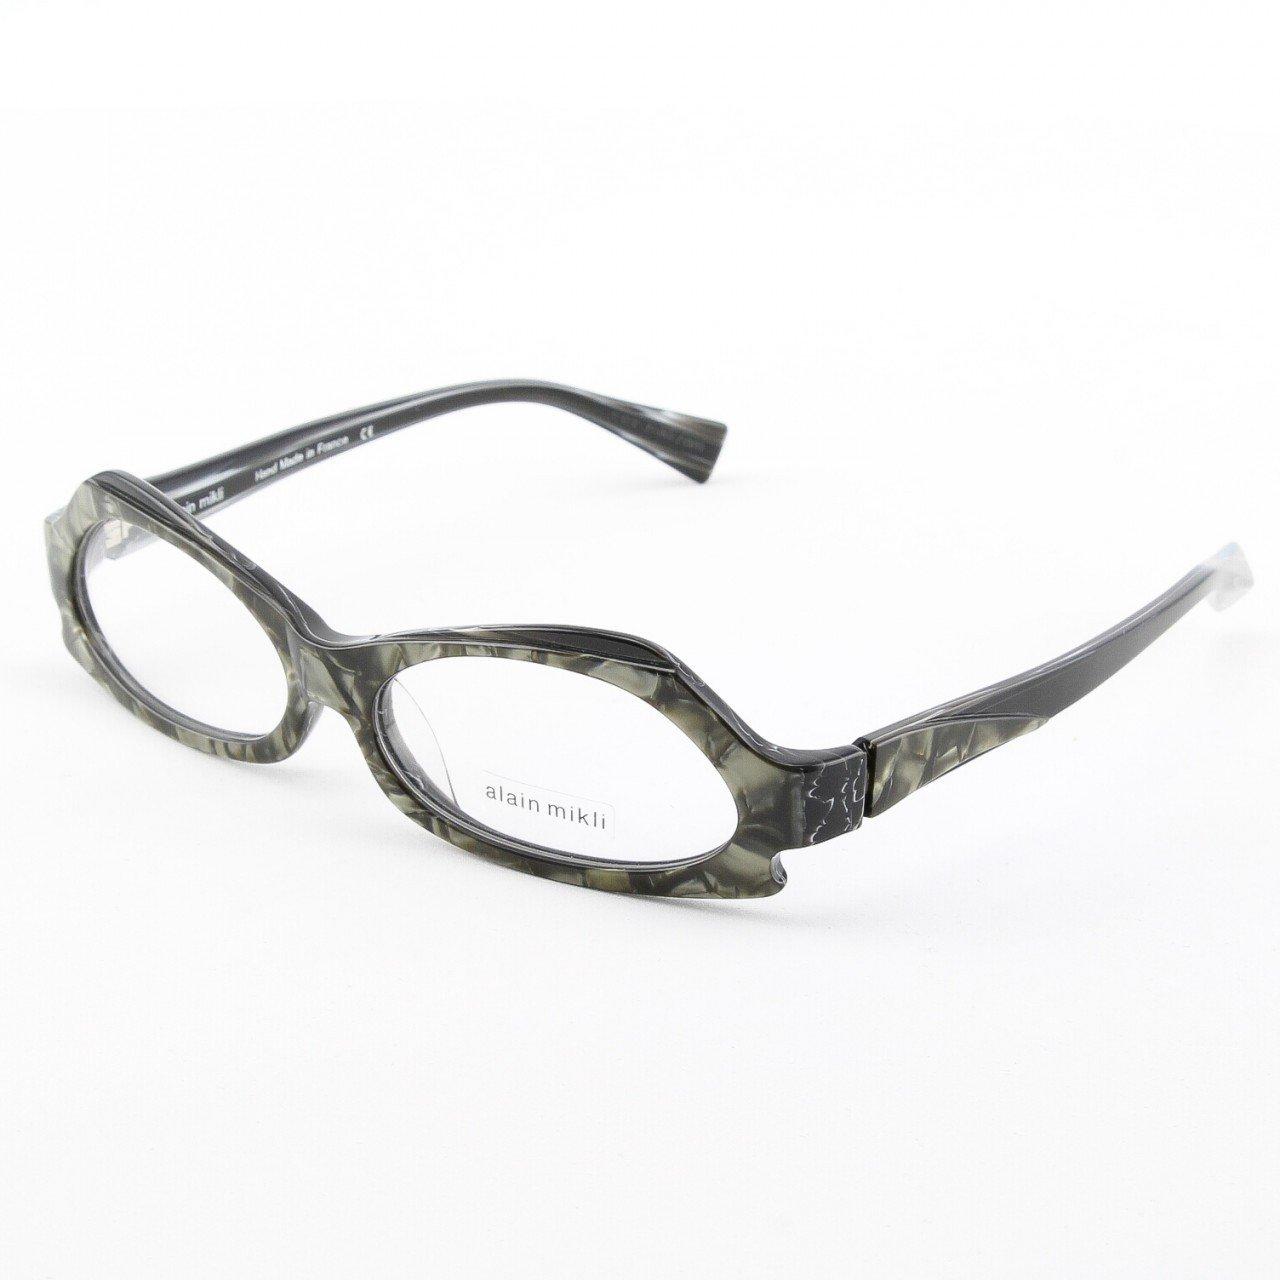 Alain Mikli Eyeglasses AL1019 Col. 4 Marbleized Black and Silver